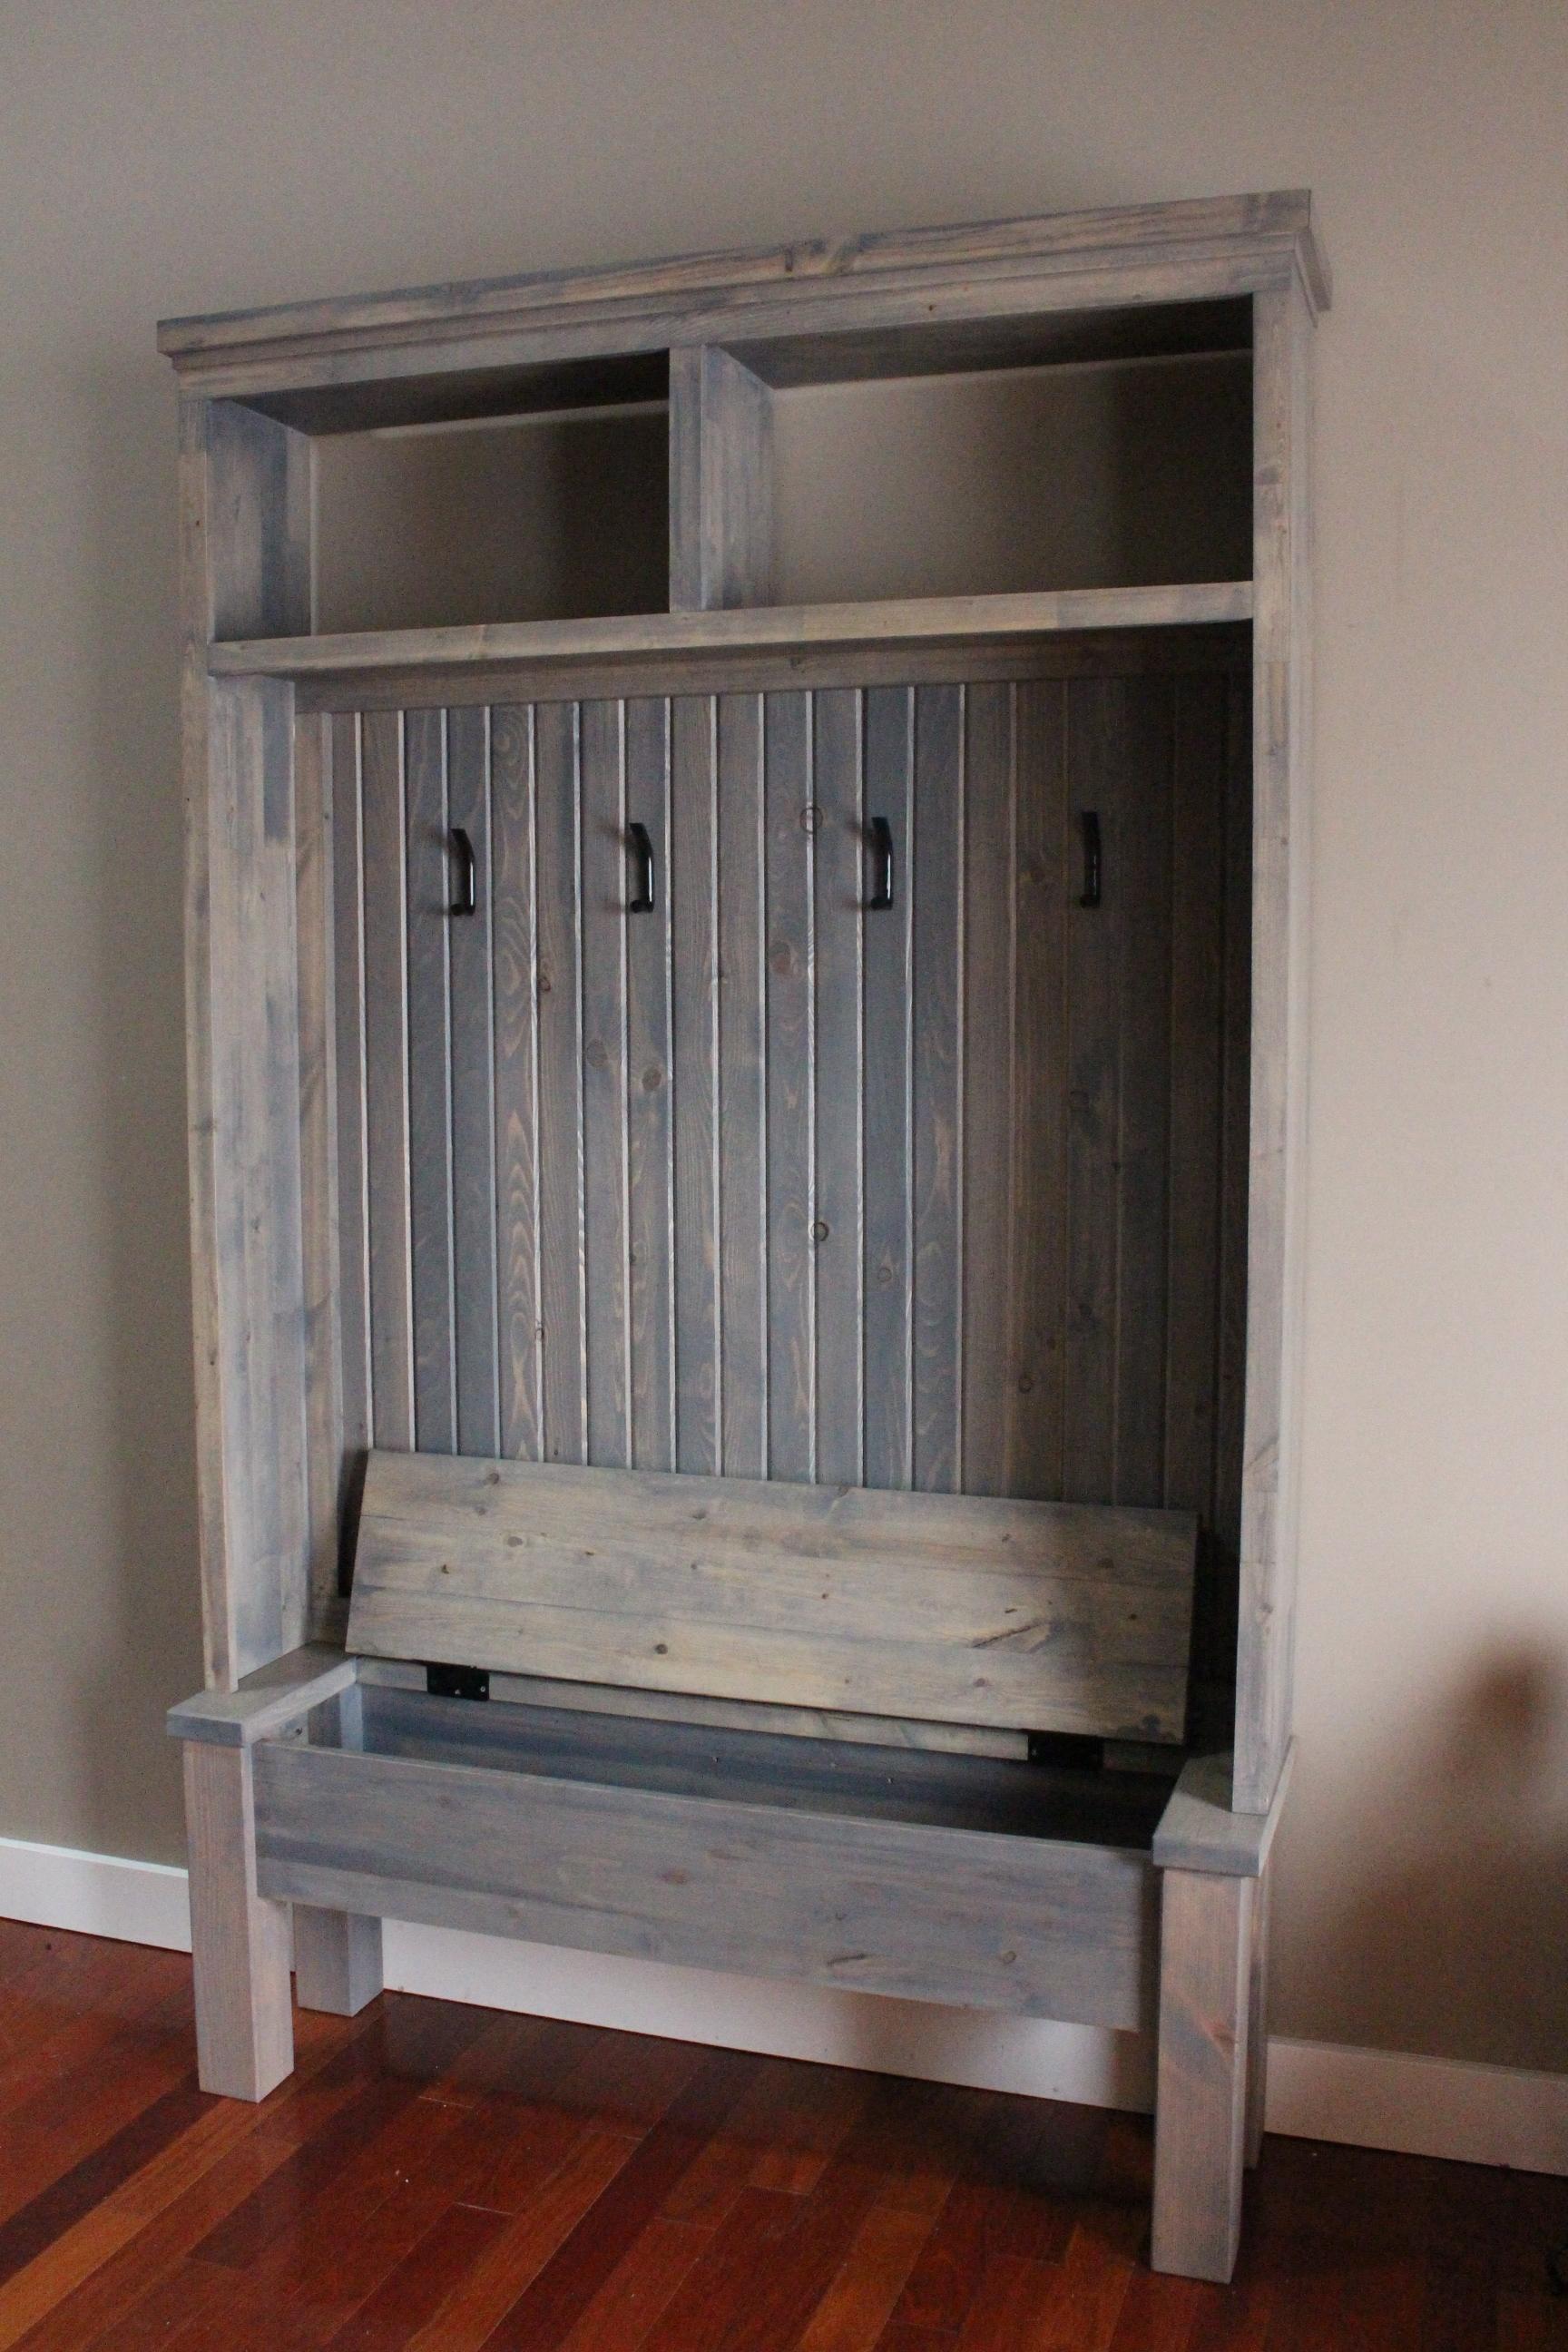 Simple and elegant storage -